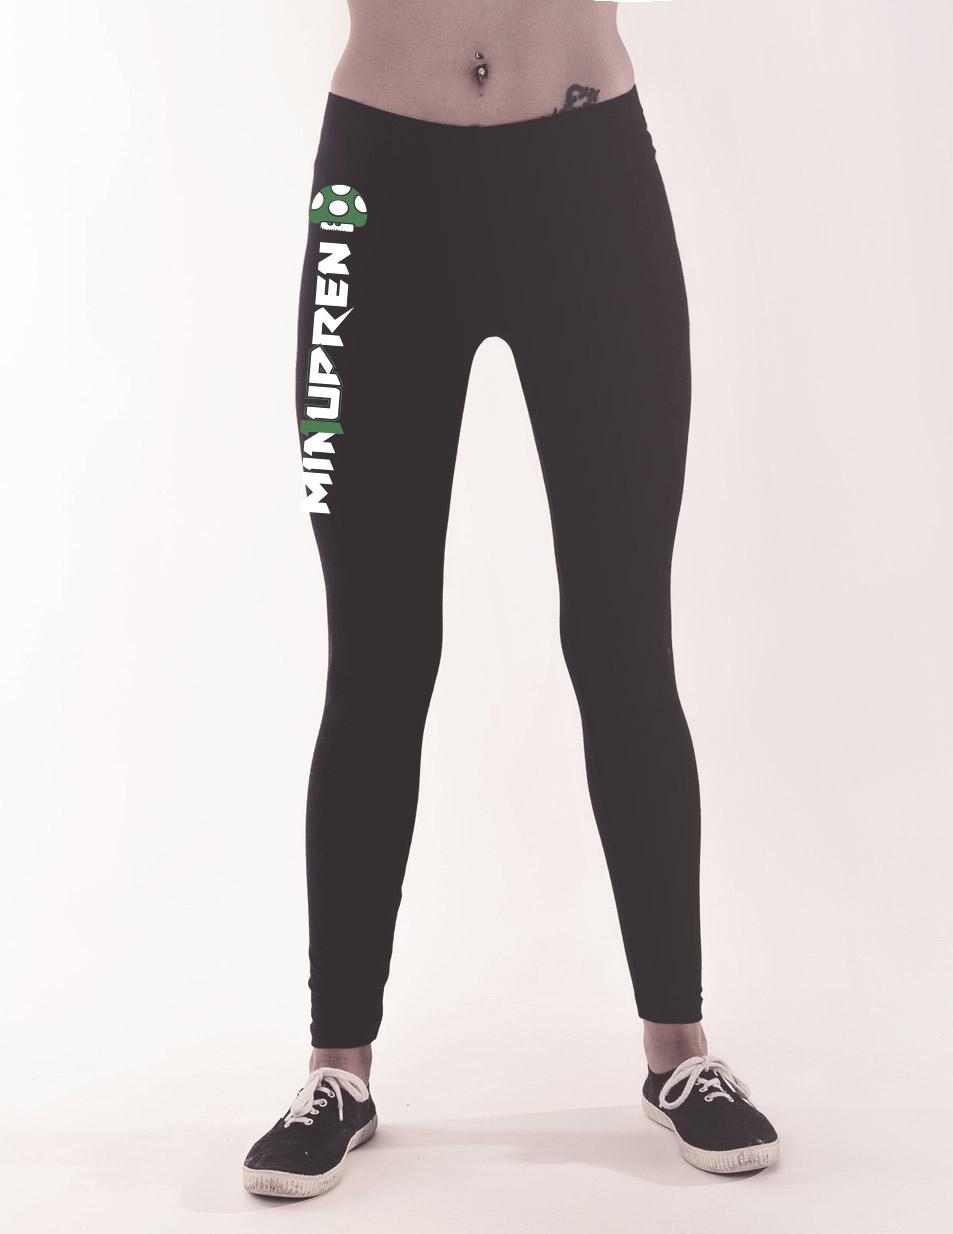 min1upren Leggings mehrfarbig auf schwarz